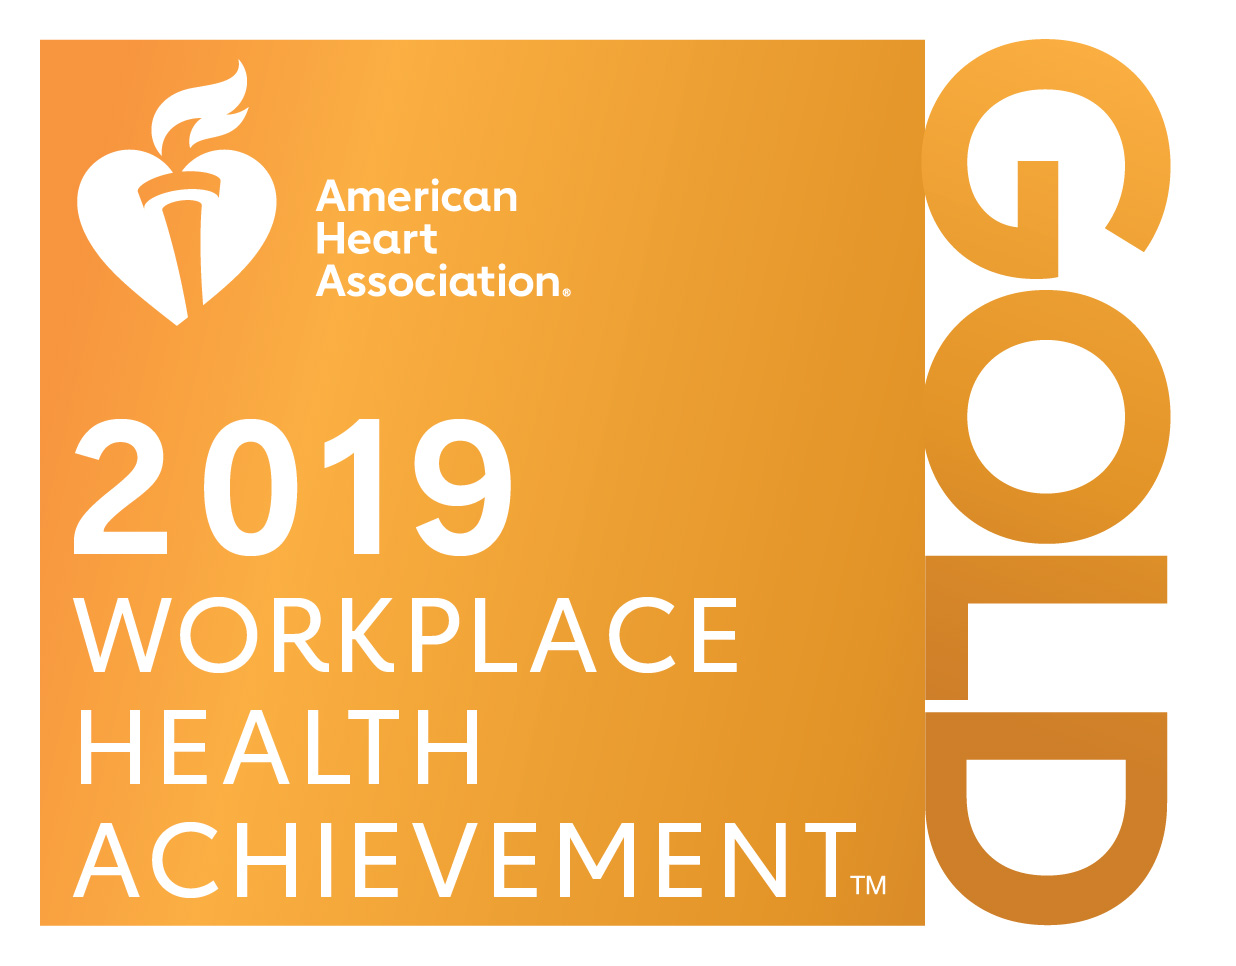 American Heart Association Workplace Health Achievement